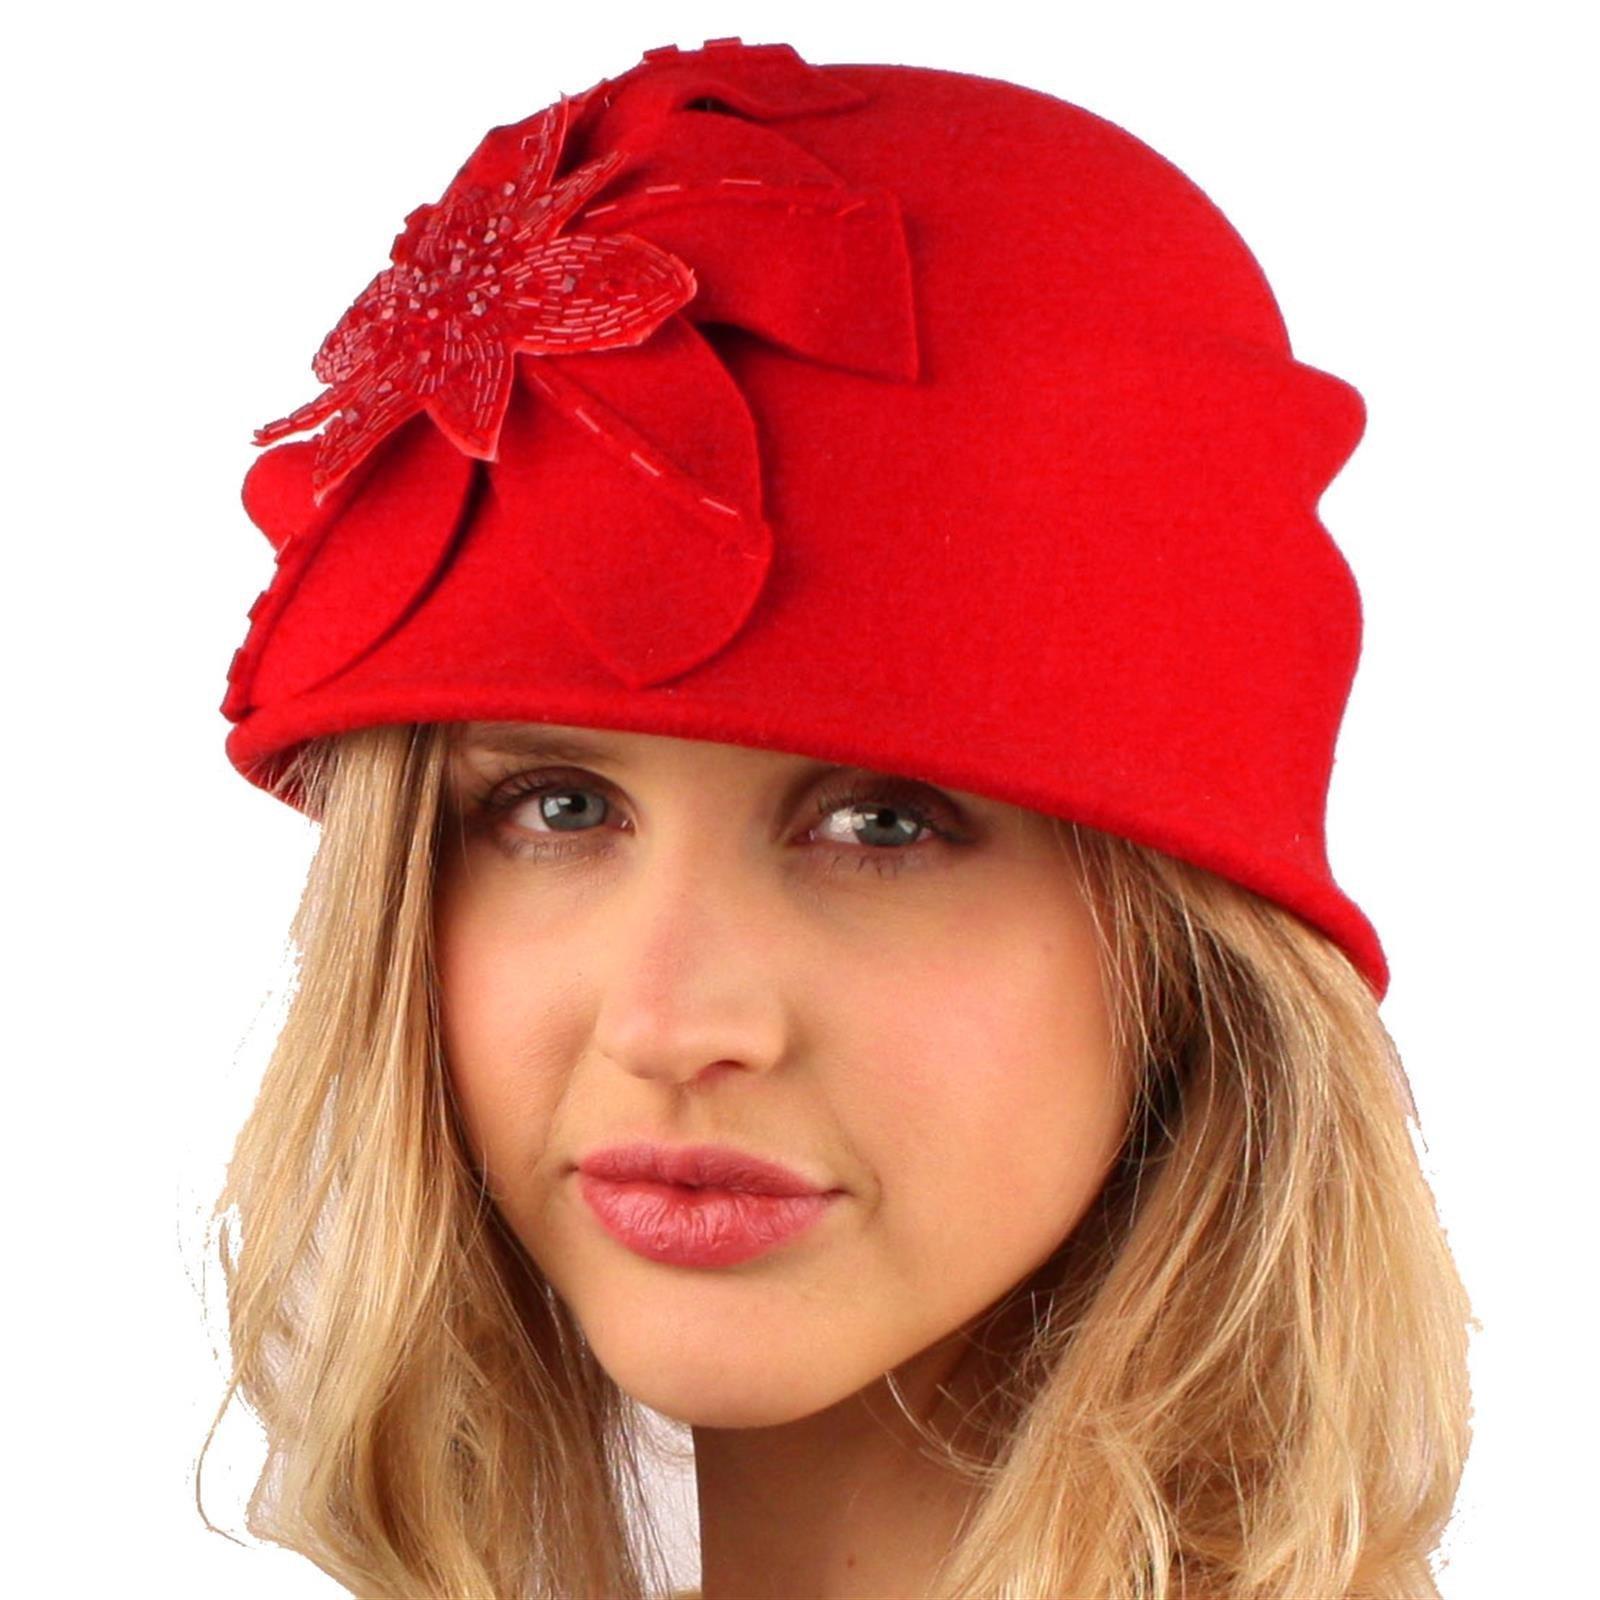 SK Hat shop Winter Wool 1920s Elegant Floral Sequins Cloche Bell Bucket Church Hat Red